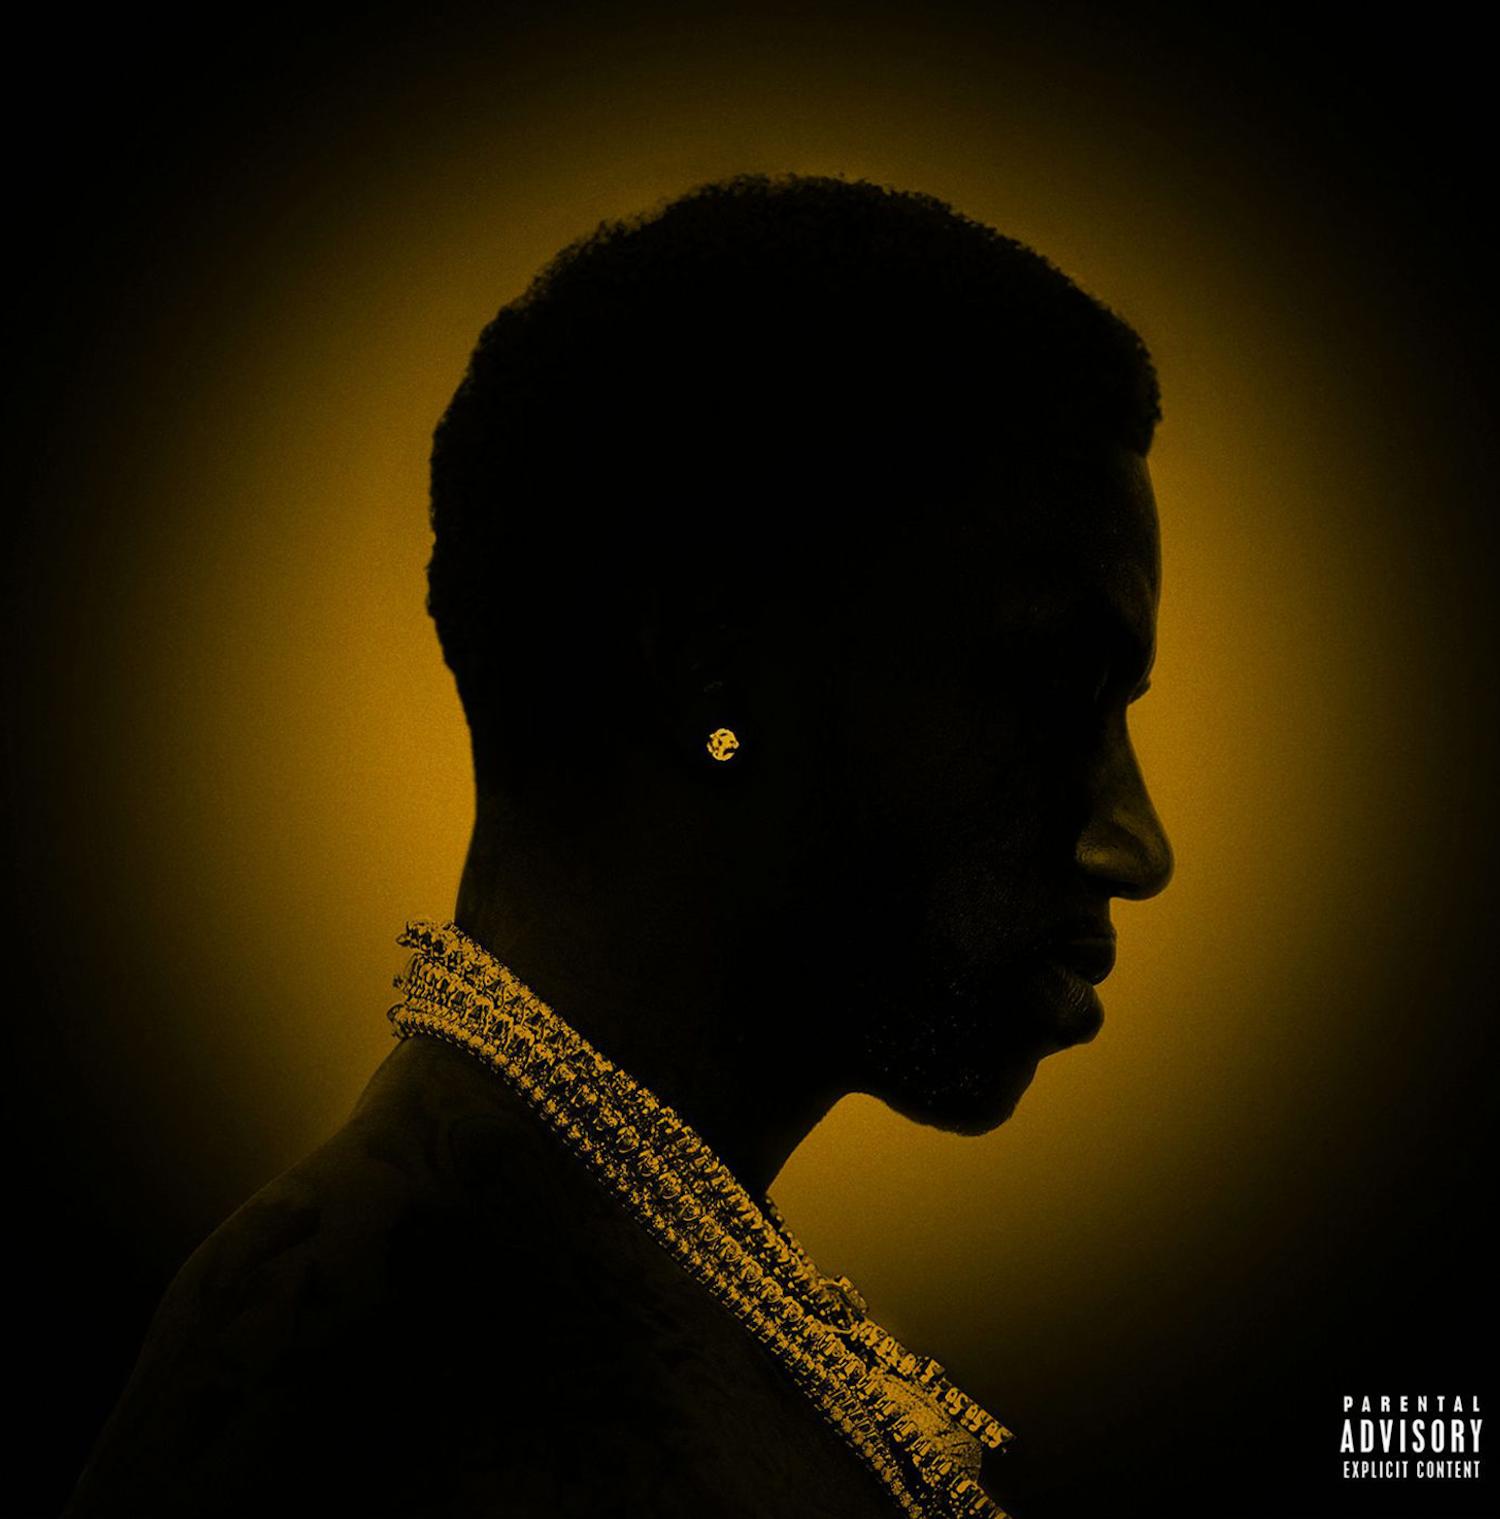 gucci mane mr davis stream download album Gucci Mane releases star studded new album Mr. Davis: Stream